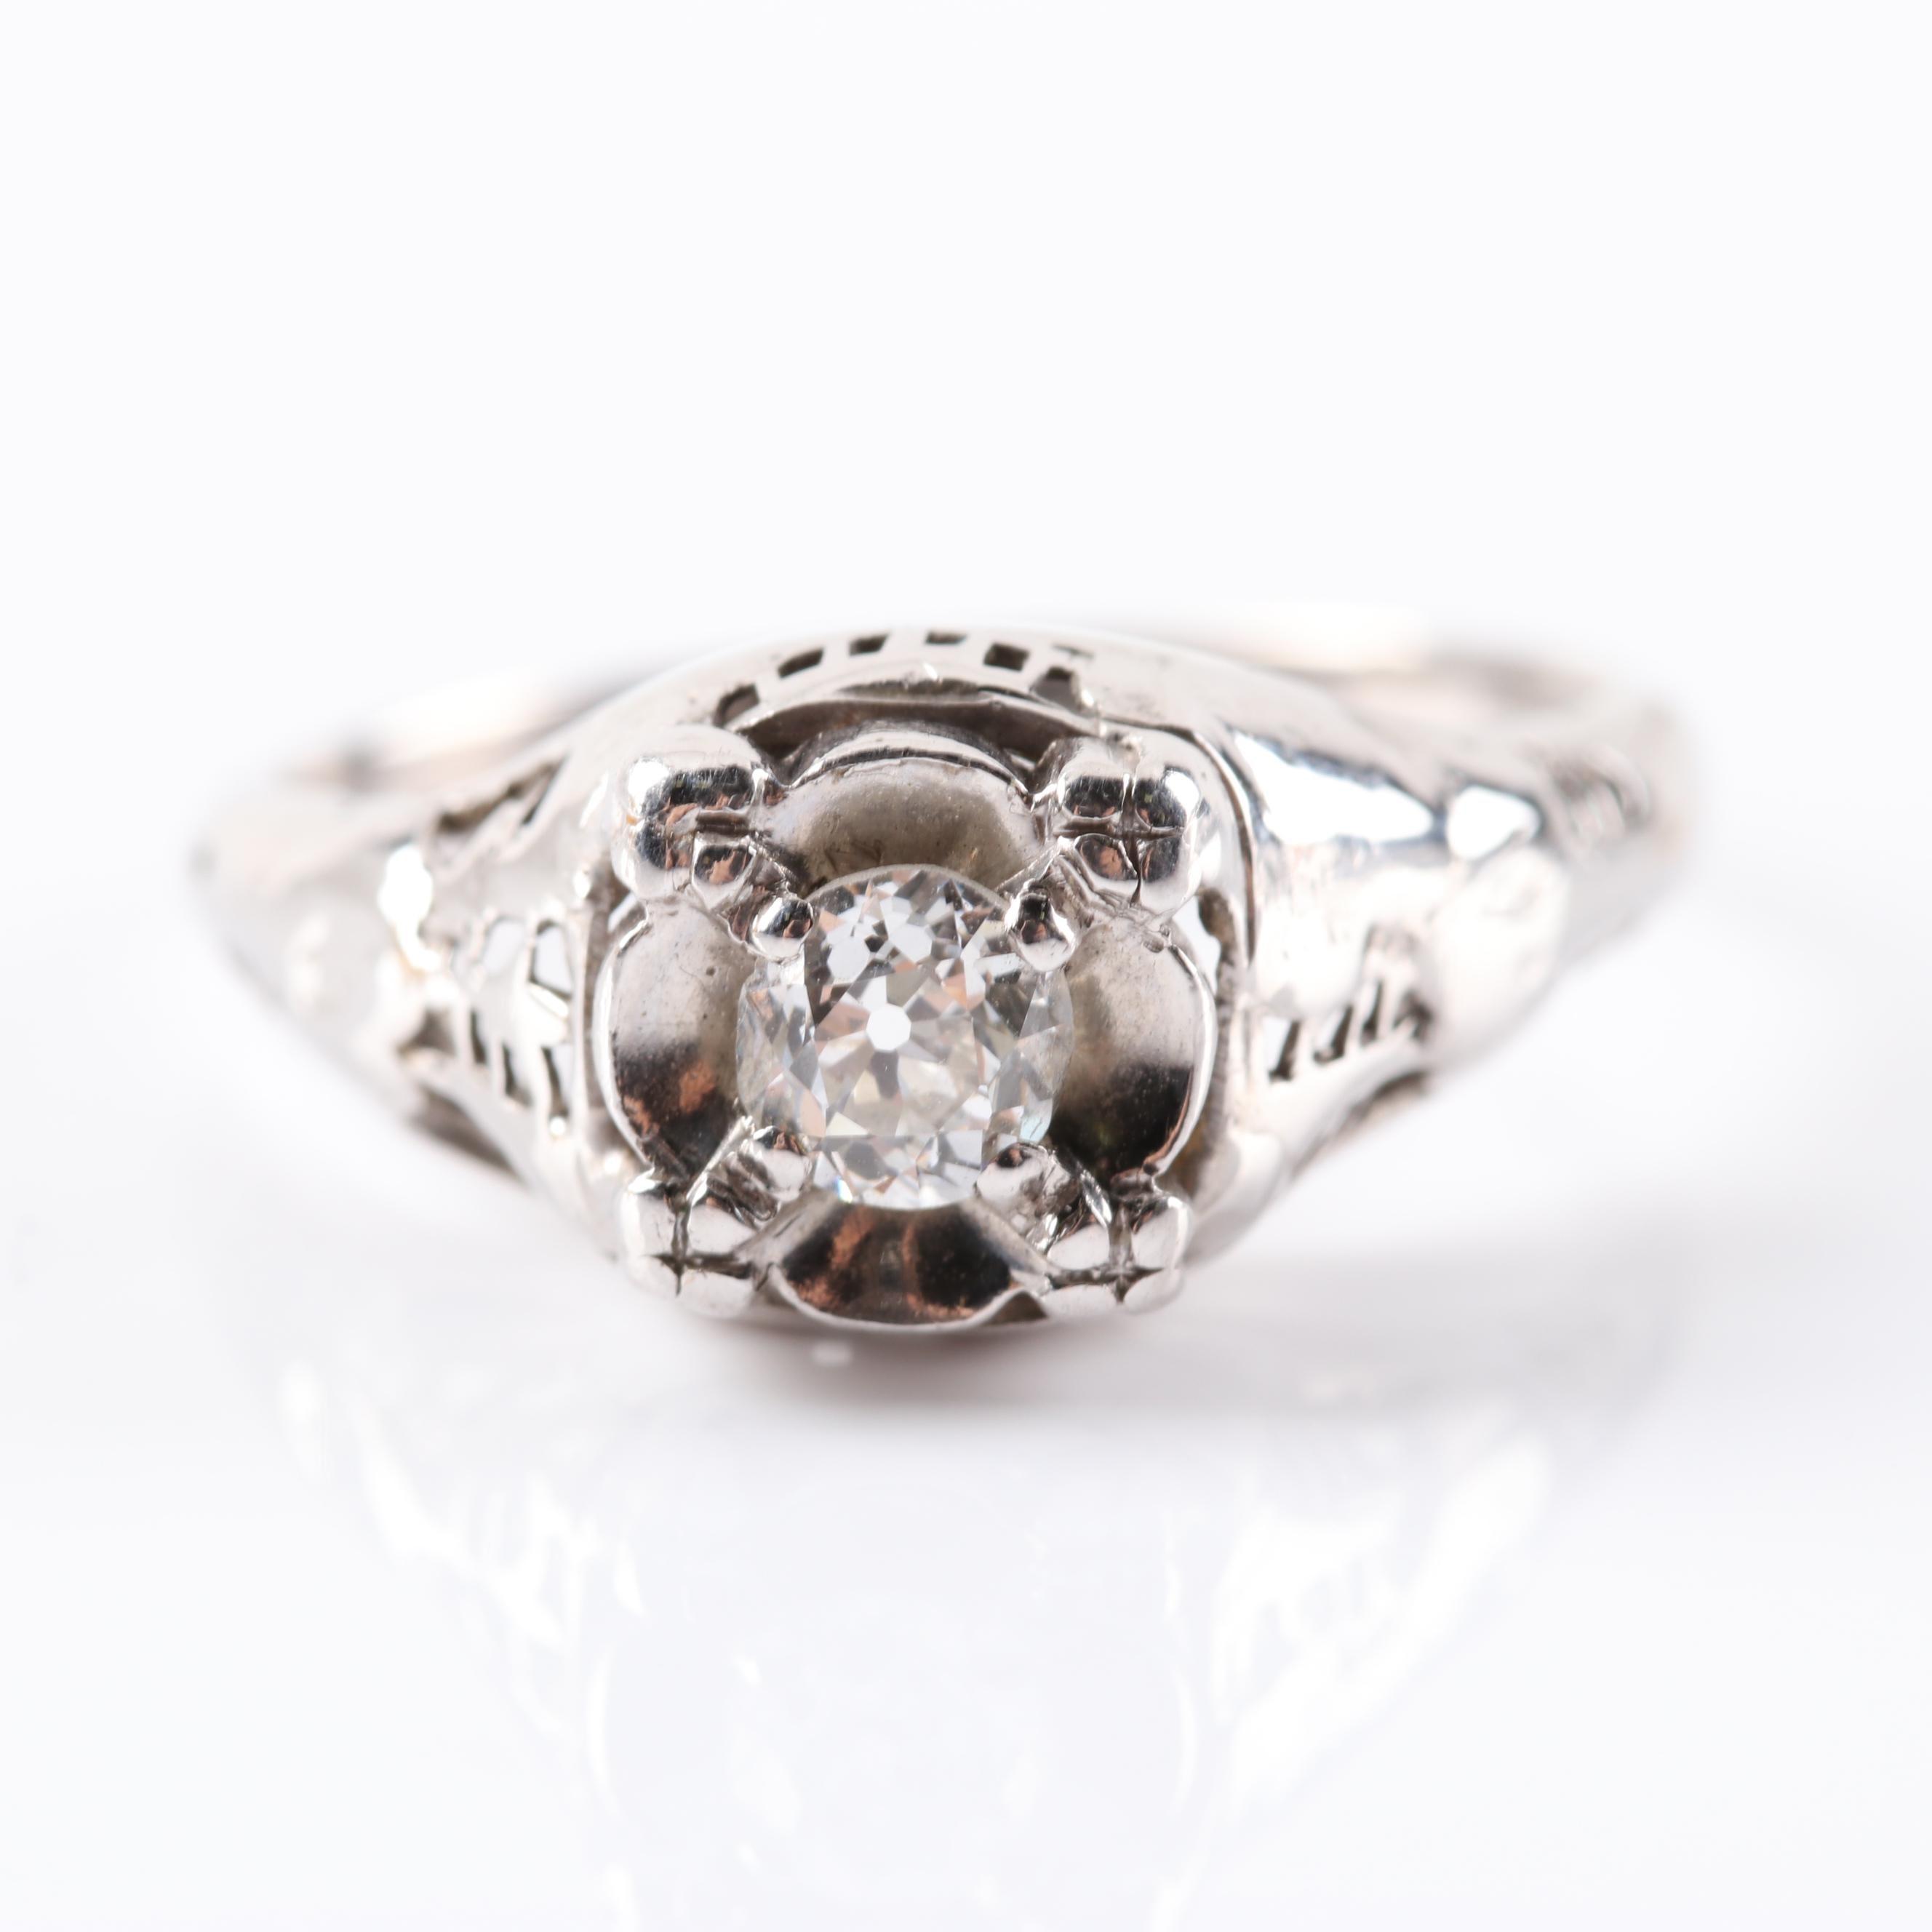 14K White Gold Old Mine Cut Diamond Filigree Ring